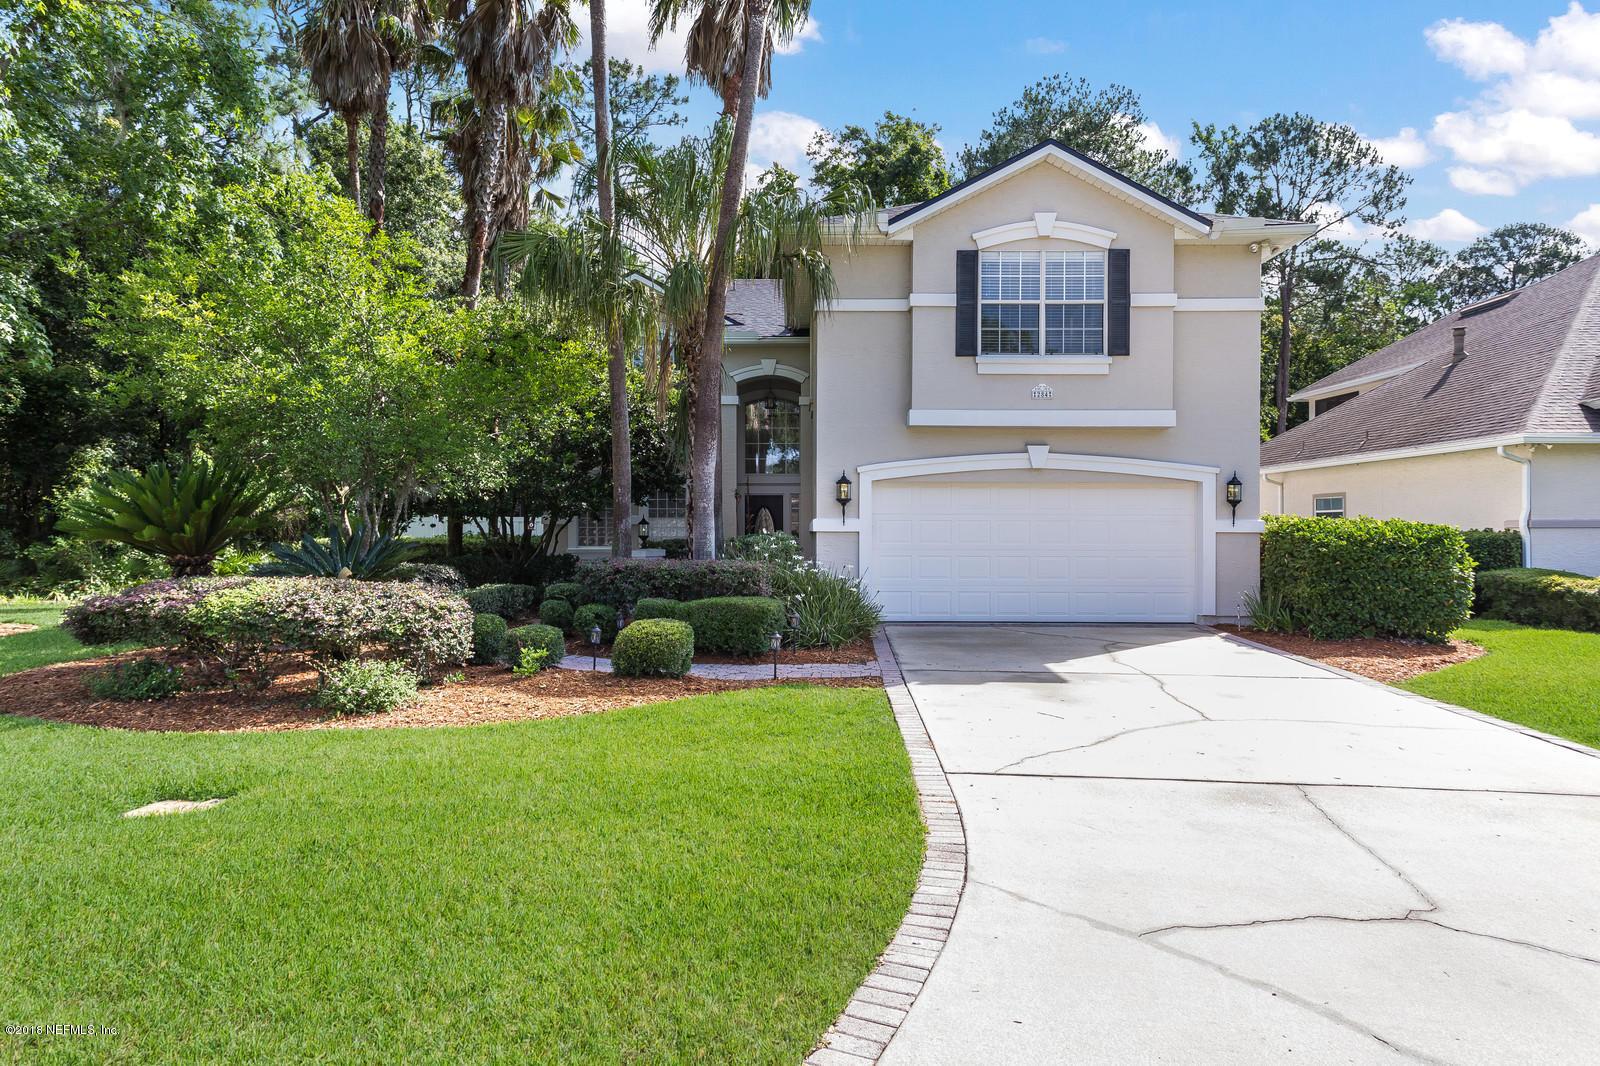 284 SWEETBRIER BRANCH, JACKSONVILLE, FLORIDA 32259, 4 Bedrooms Bedrooms, ,3 BathroomsBathrooms,Residential - single family,For sale,SWEETBRIER BRANCH,1021855